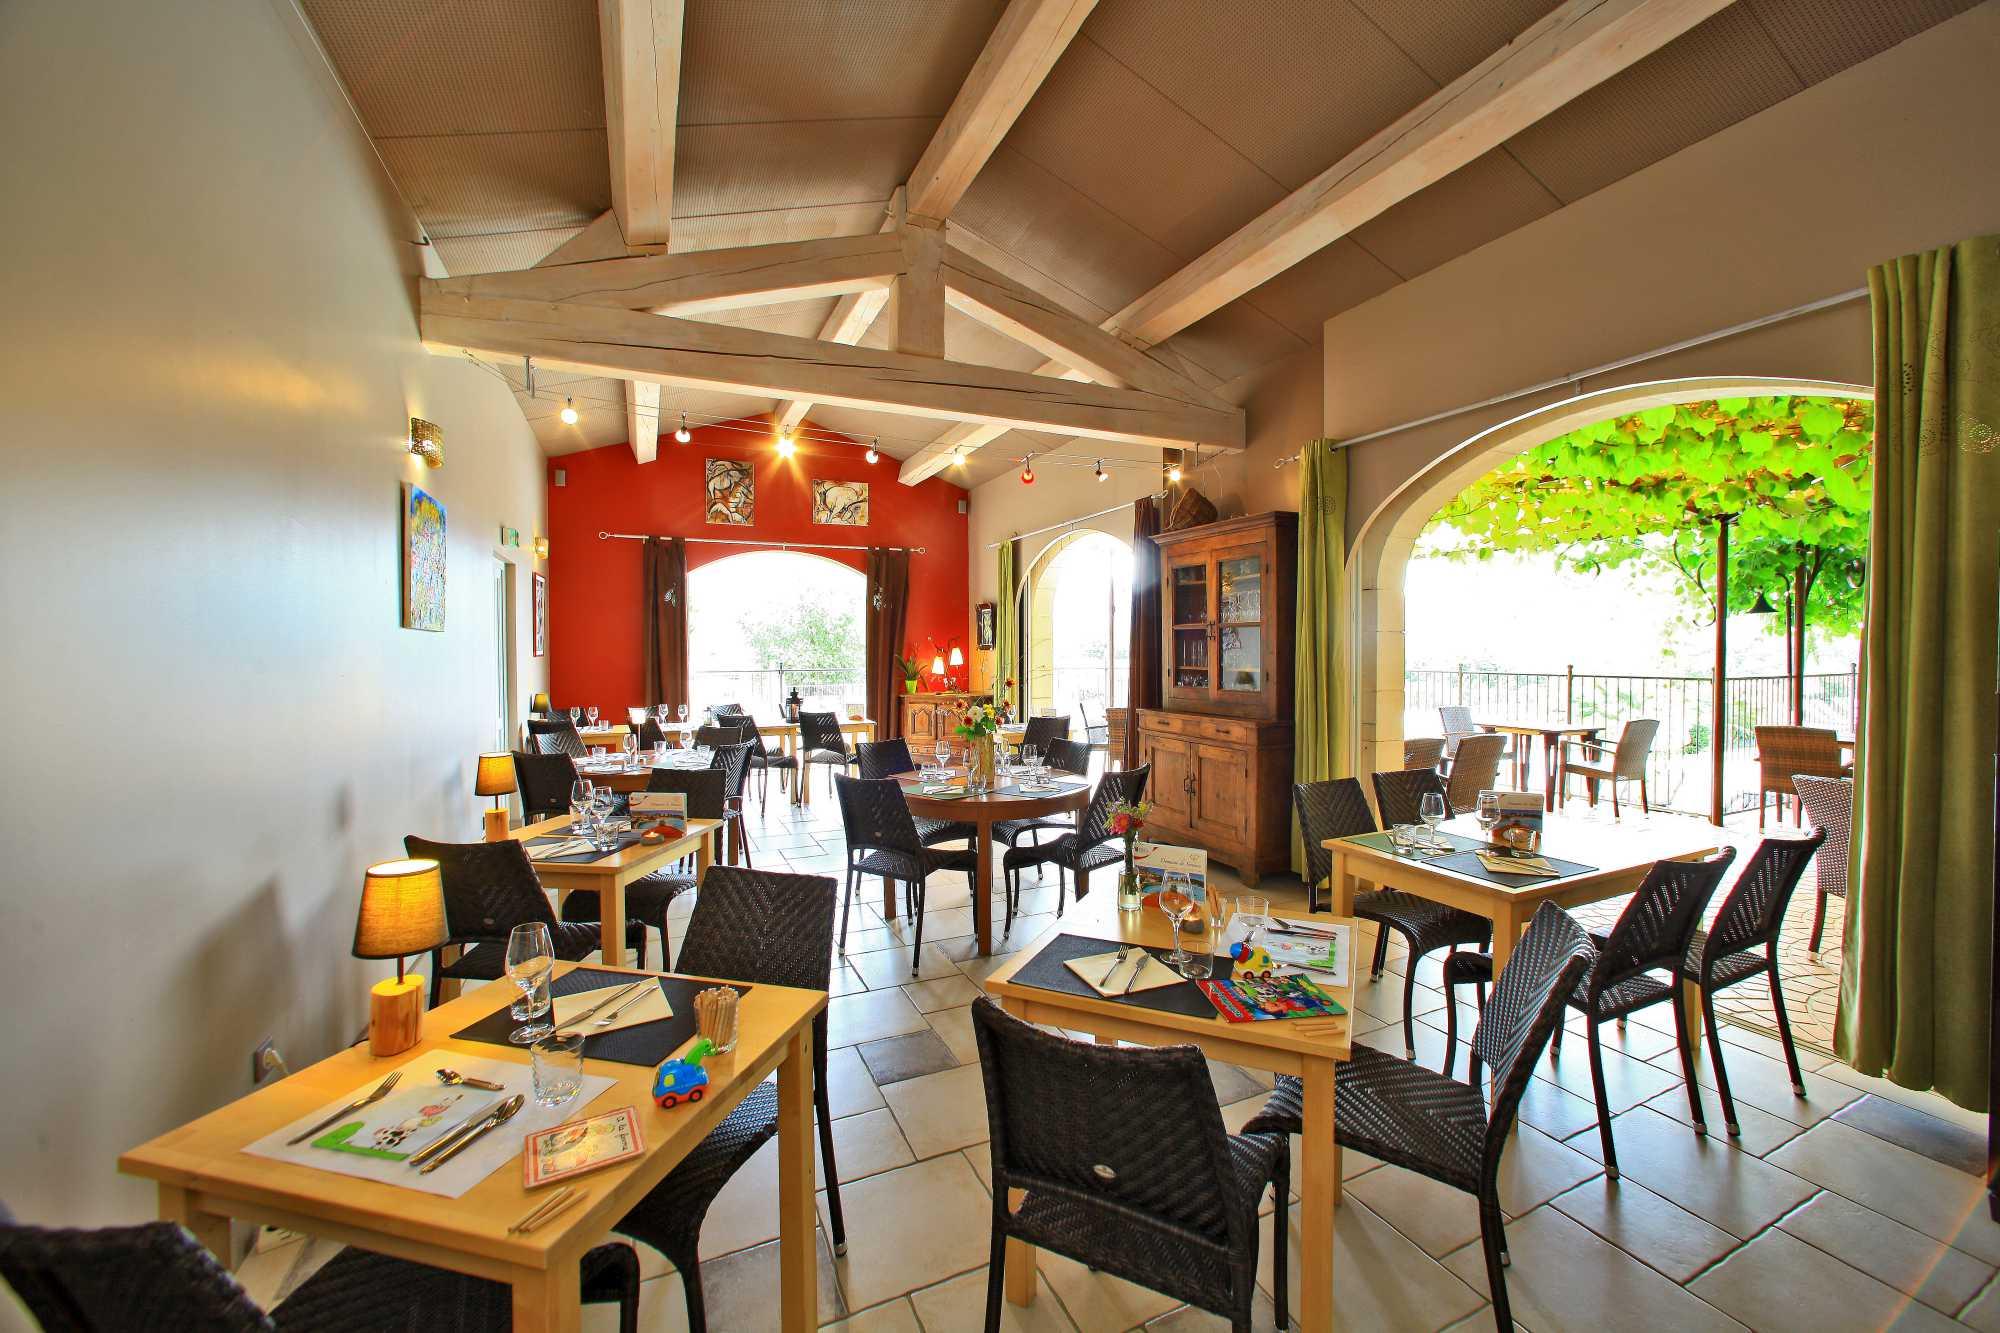 domaine sevenier camping 5 etoiles ardeche restaurant galerie photo5 - domaine-sevenier-camping-5-etoiles-ardeche-restaurant-galerie-photo5